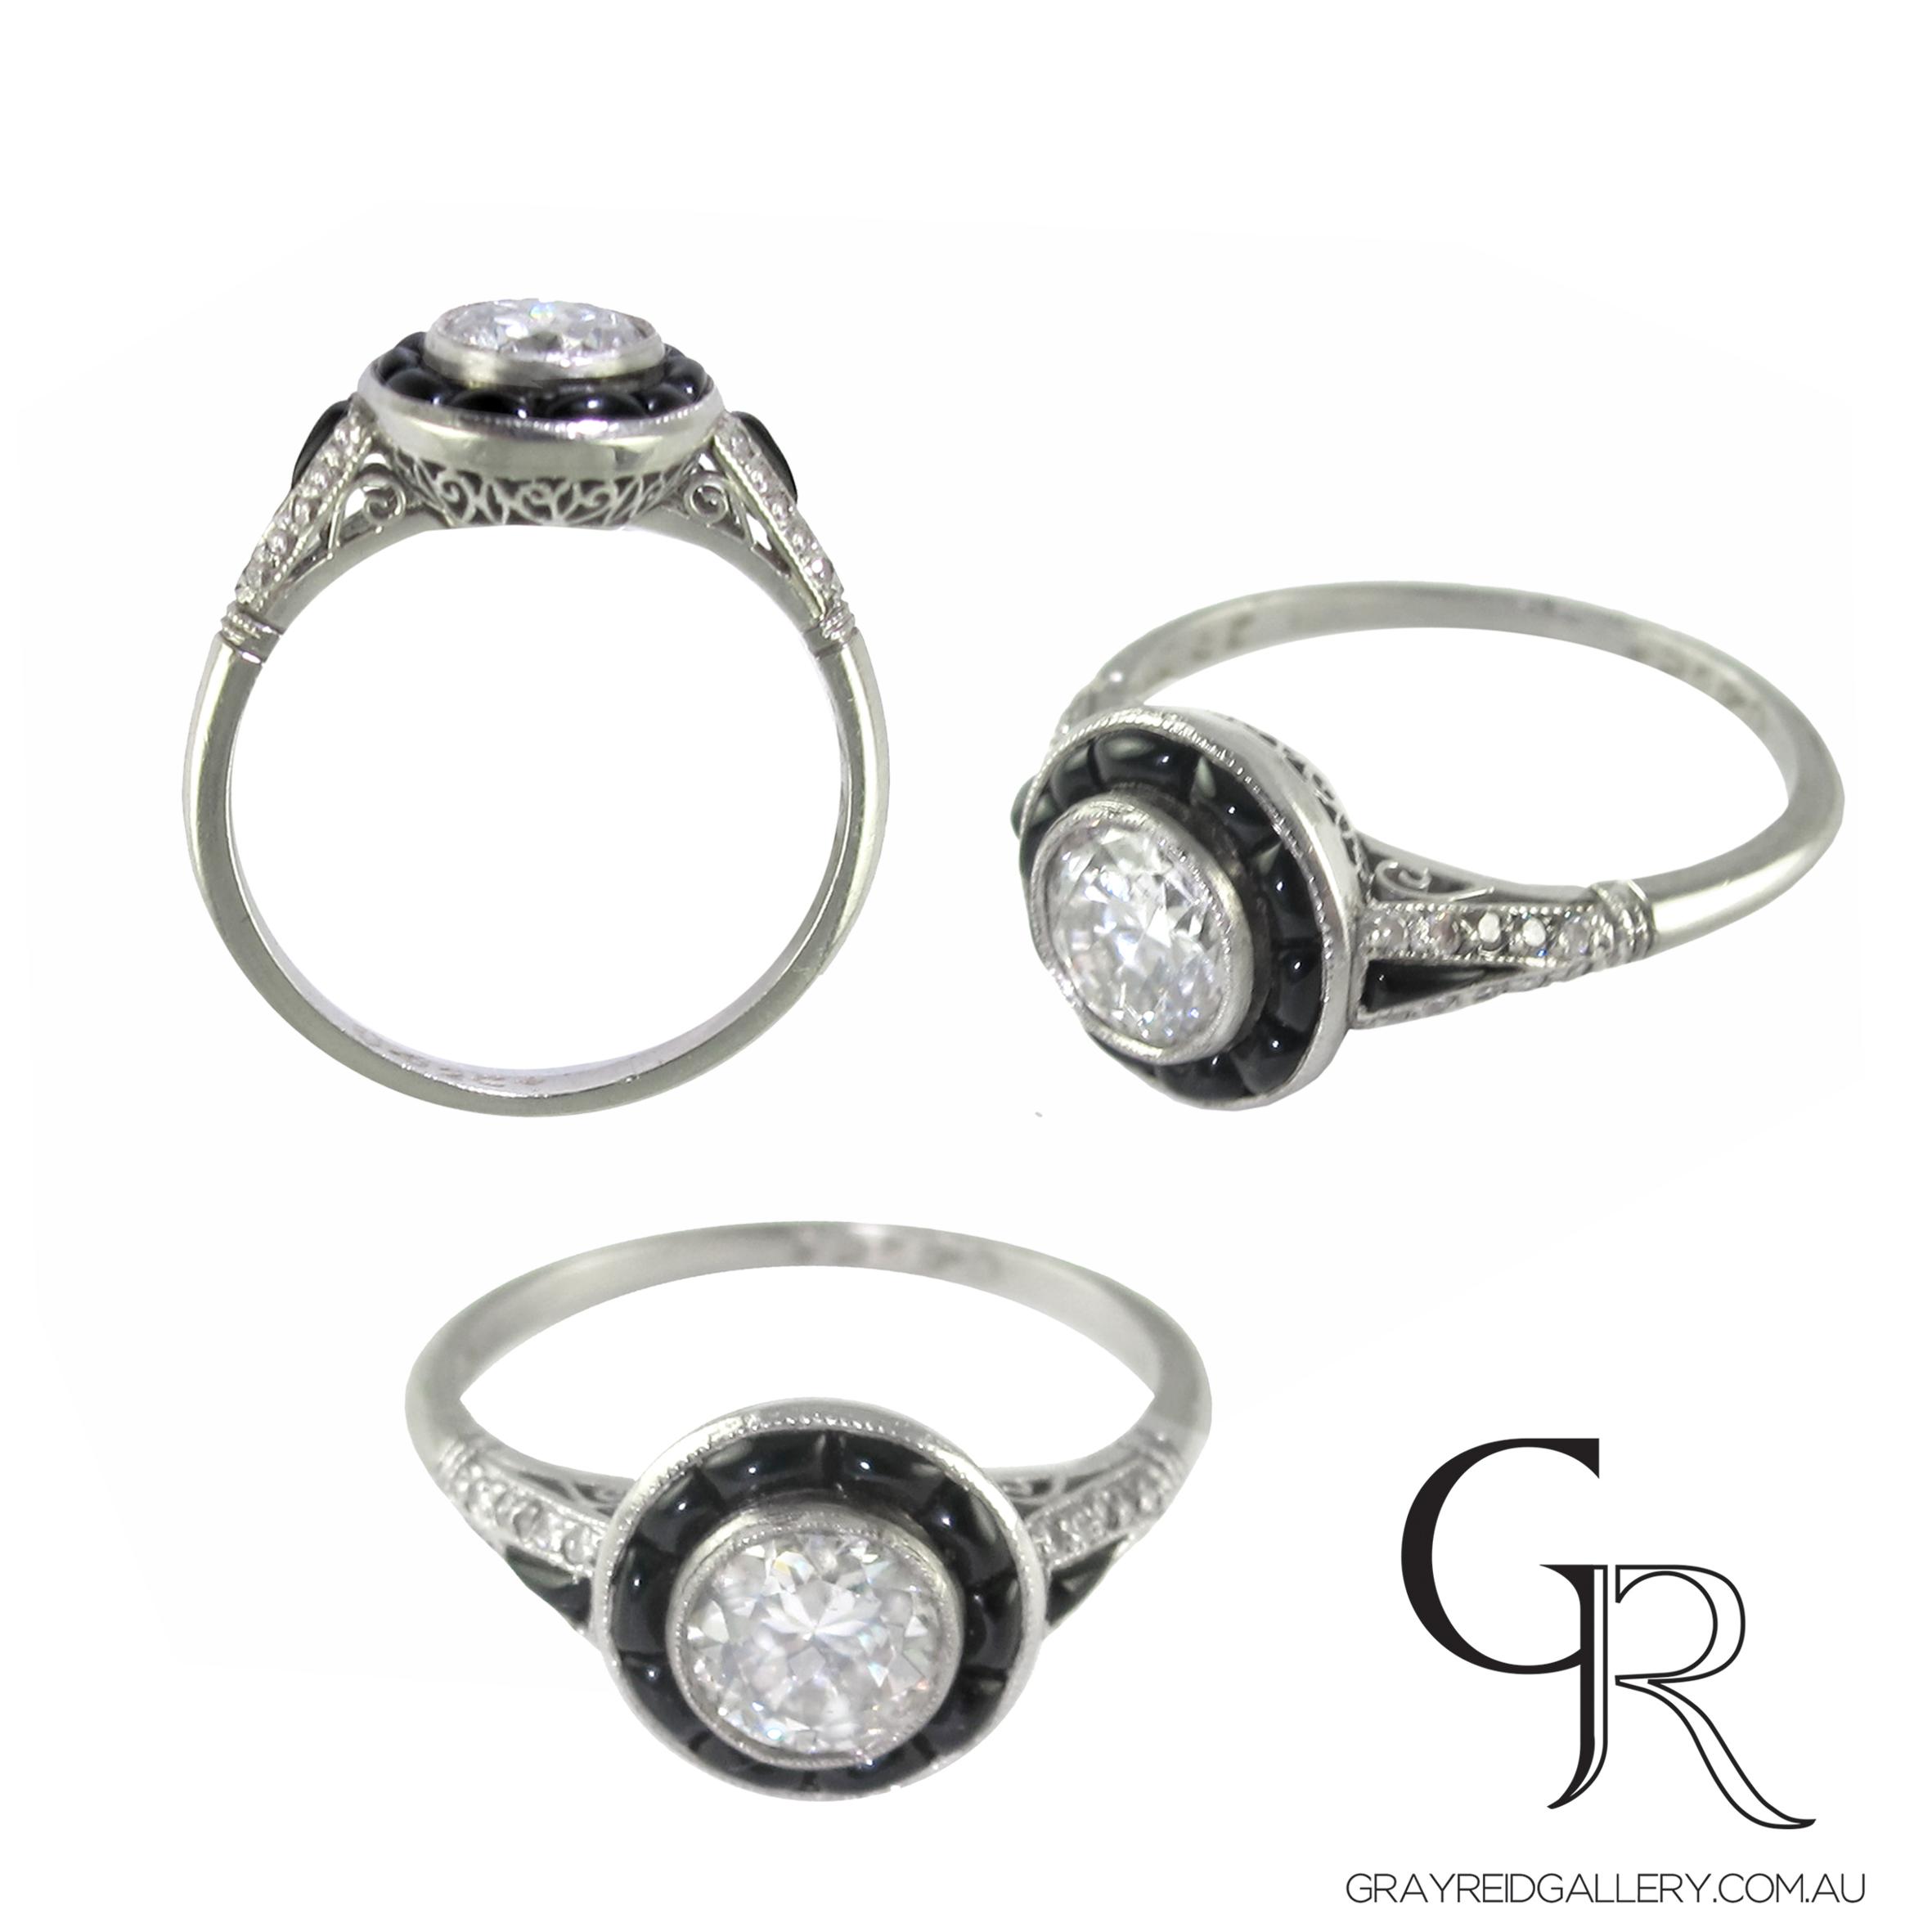 Art Deco Ring Designs Gray Reid Gallery .jpg